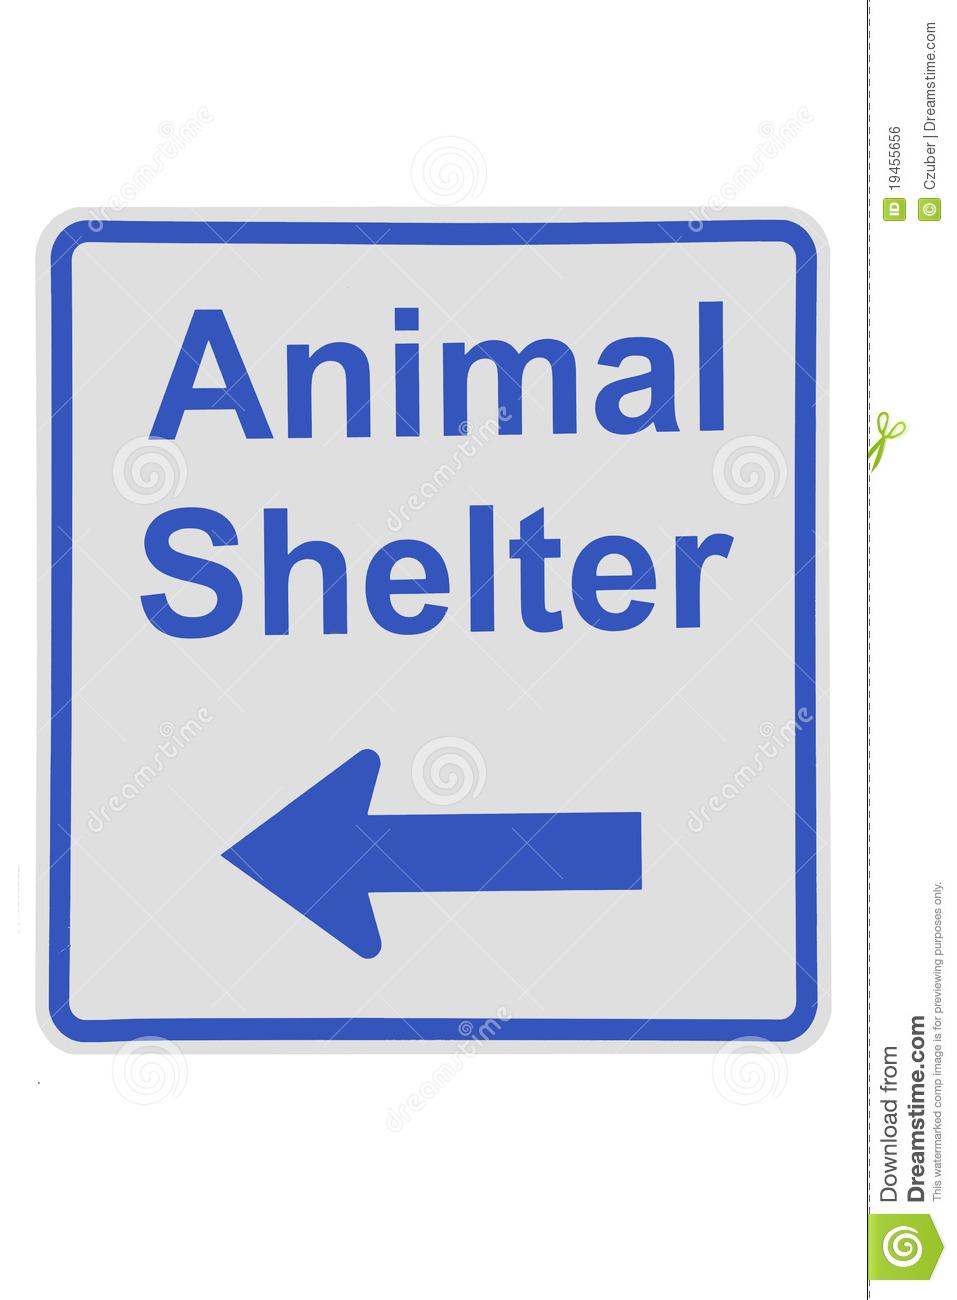 Animal Shelter Sign Royalty Free Stock I-Animal Shelter Sign Royalty Free Stock Image Image 19455656-4